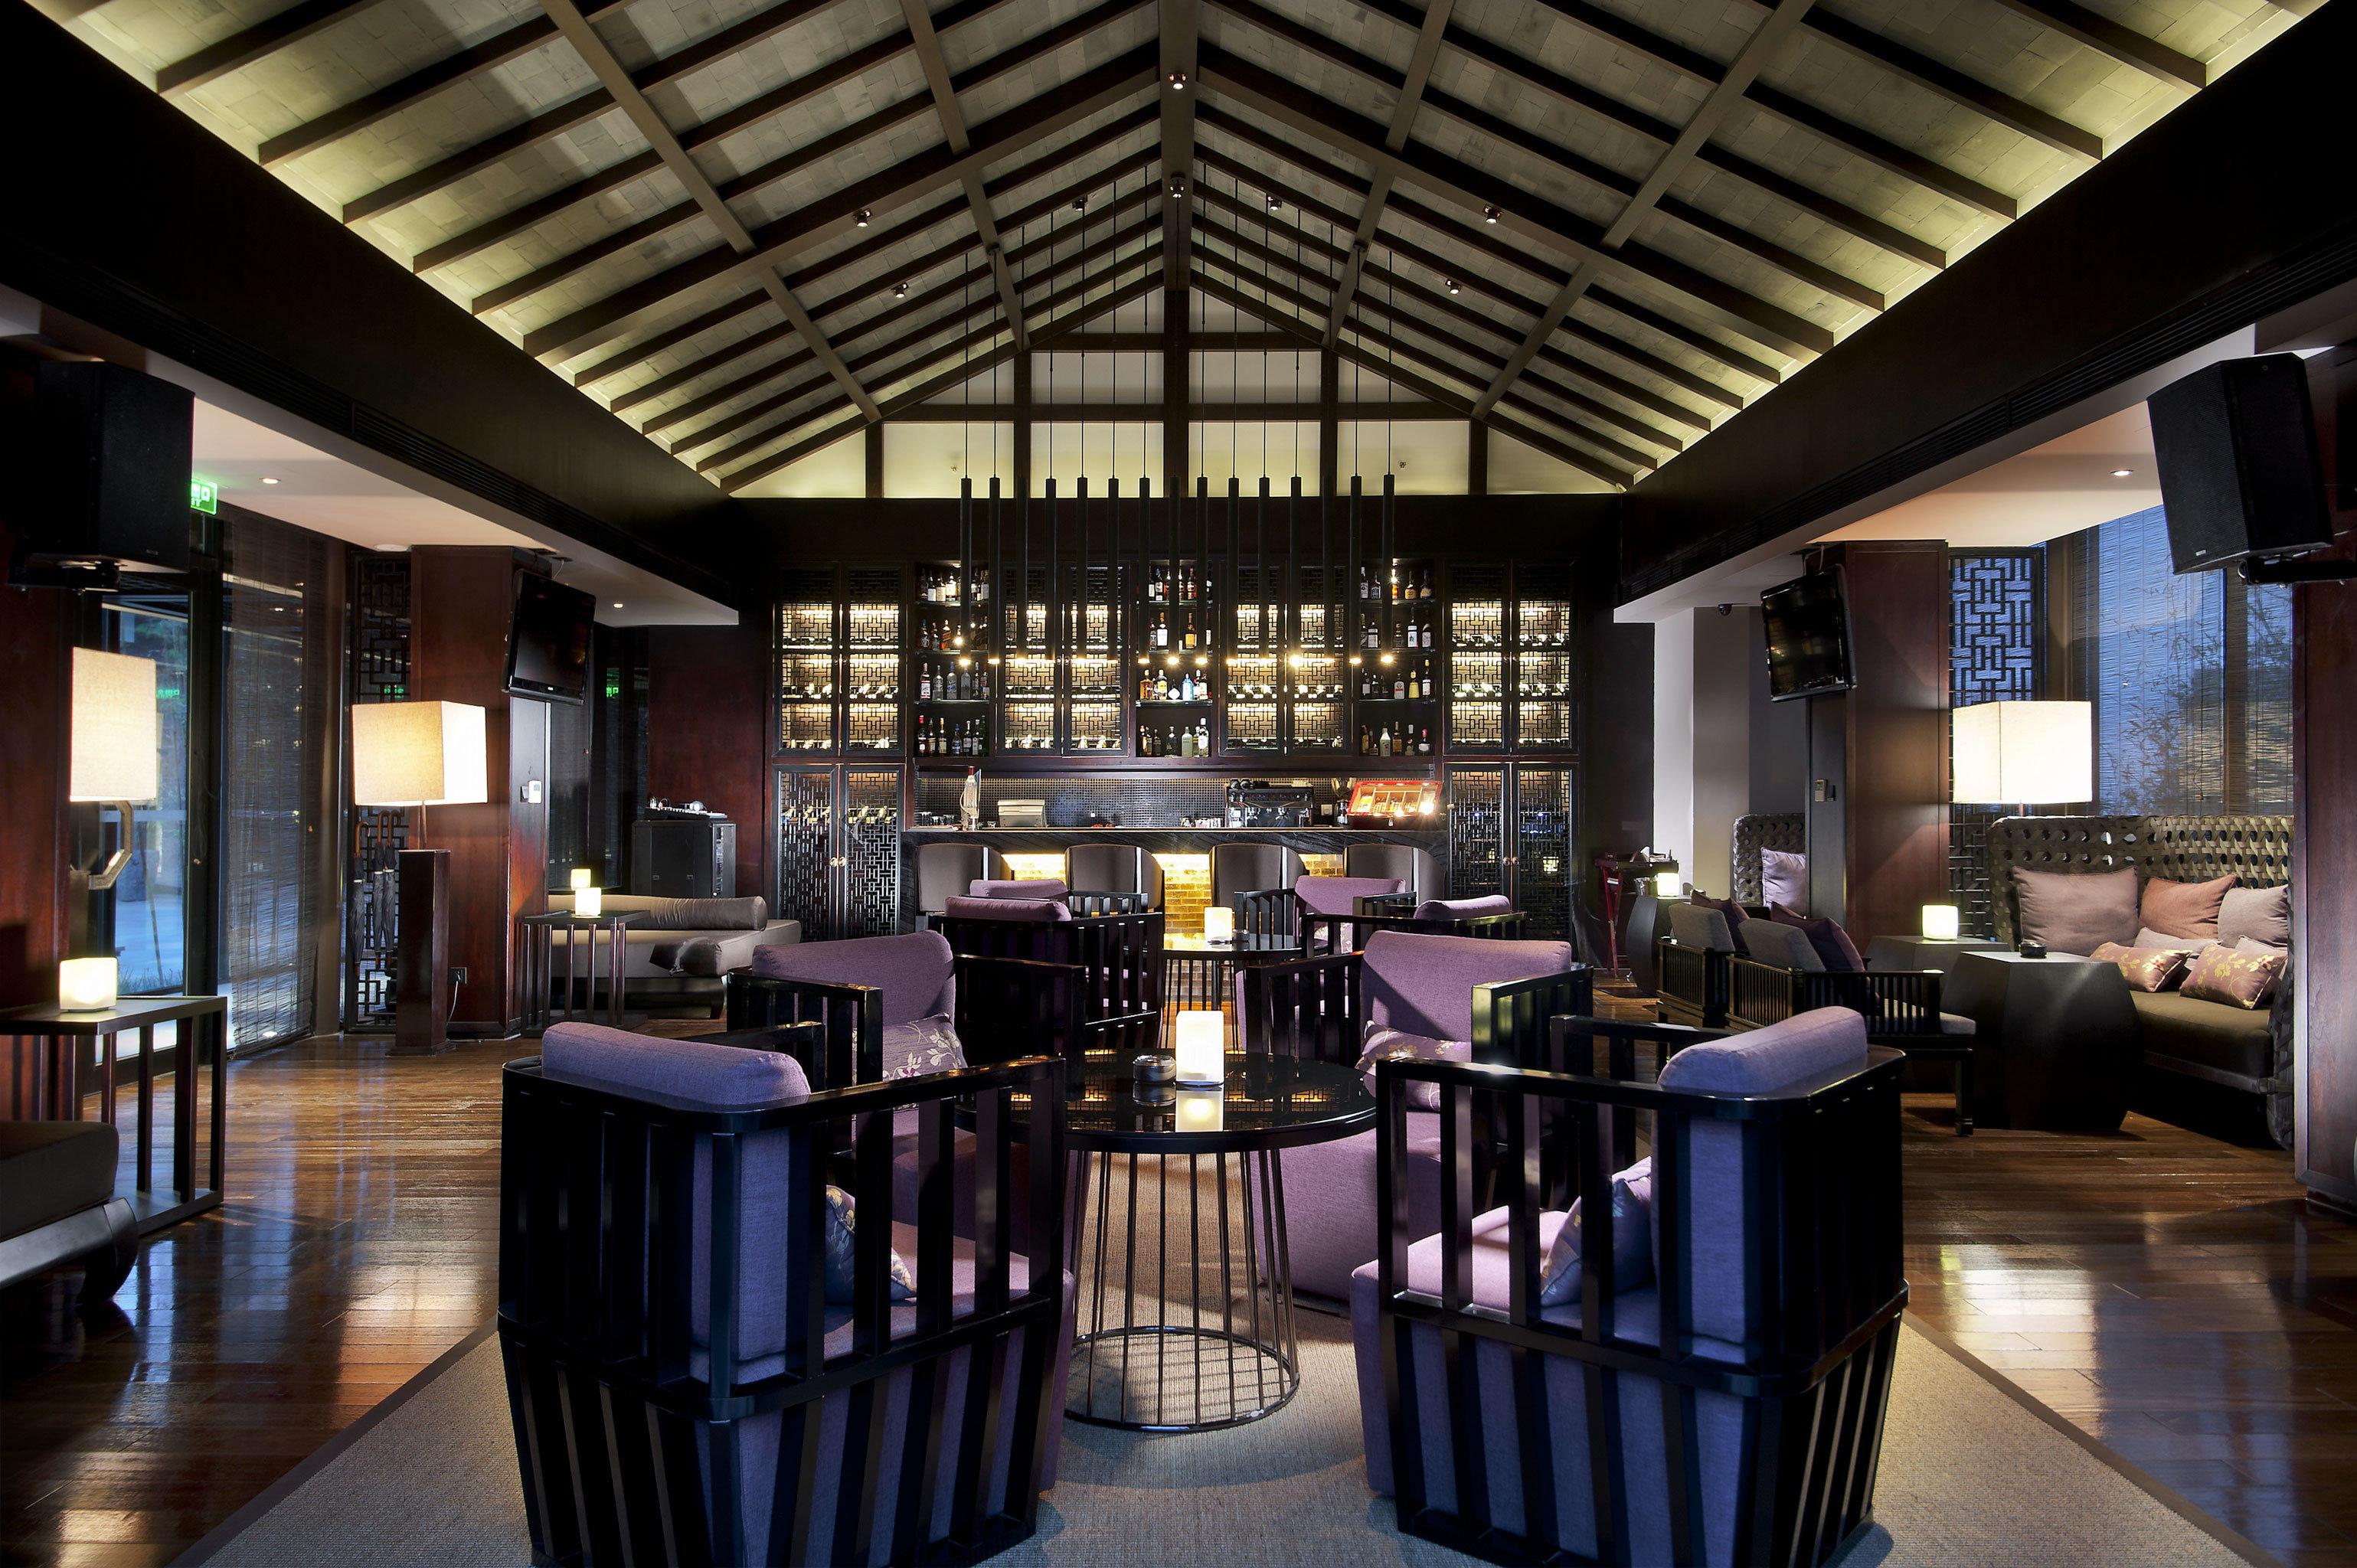 Bar Dining Drink Eat Nightlife Resort chair Lobby restaurant lighting function hall convention center